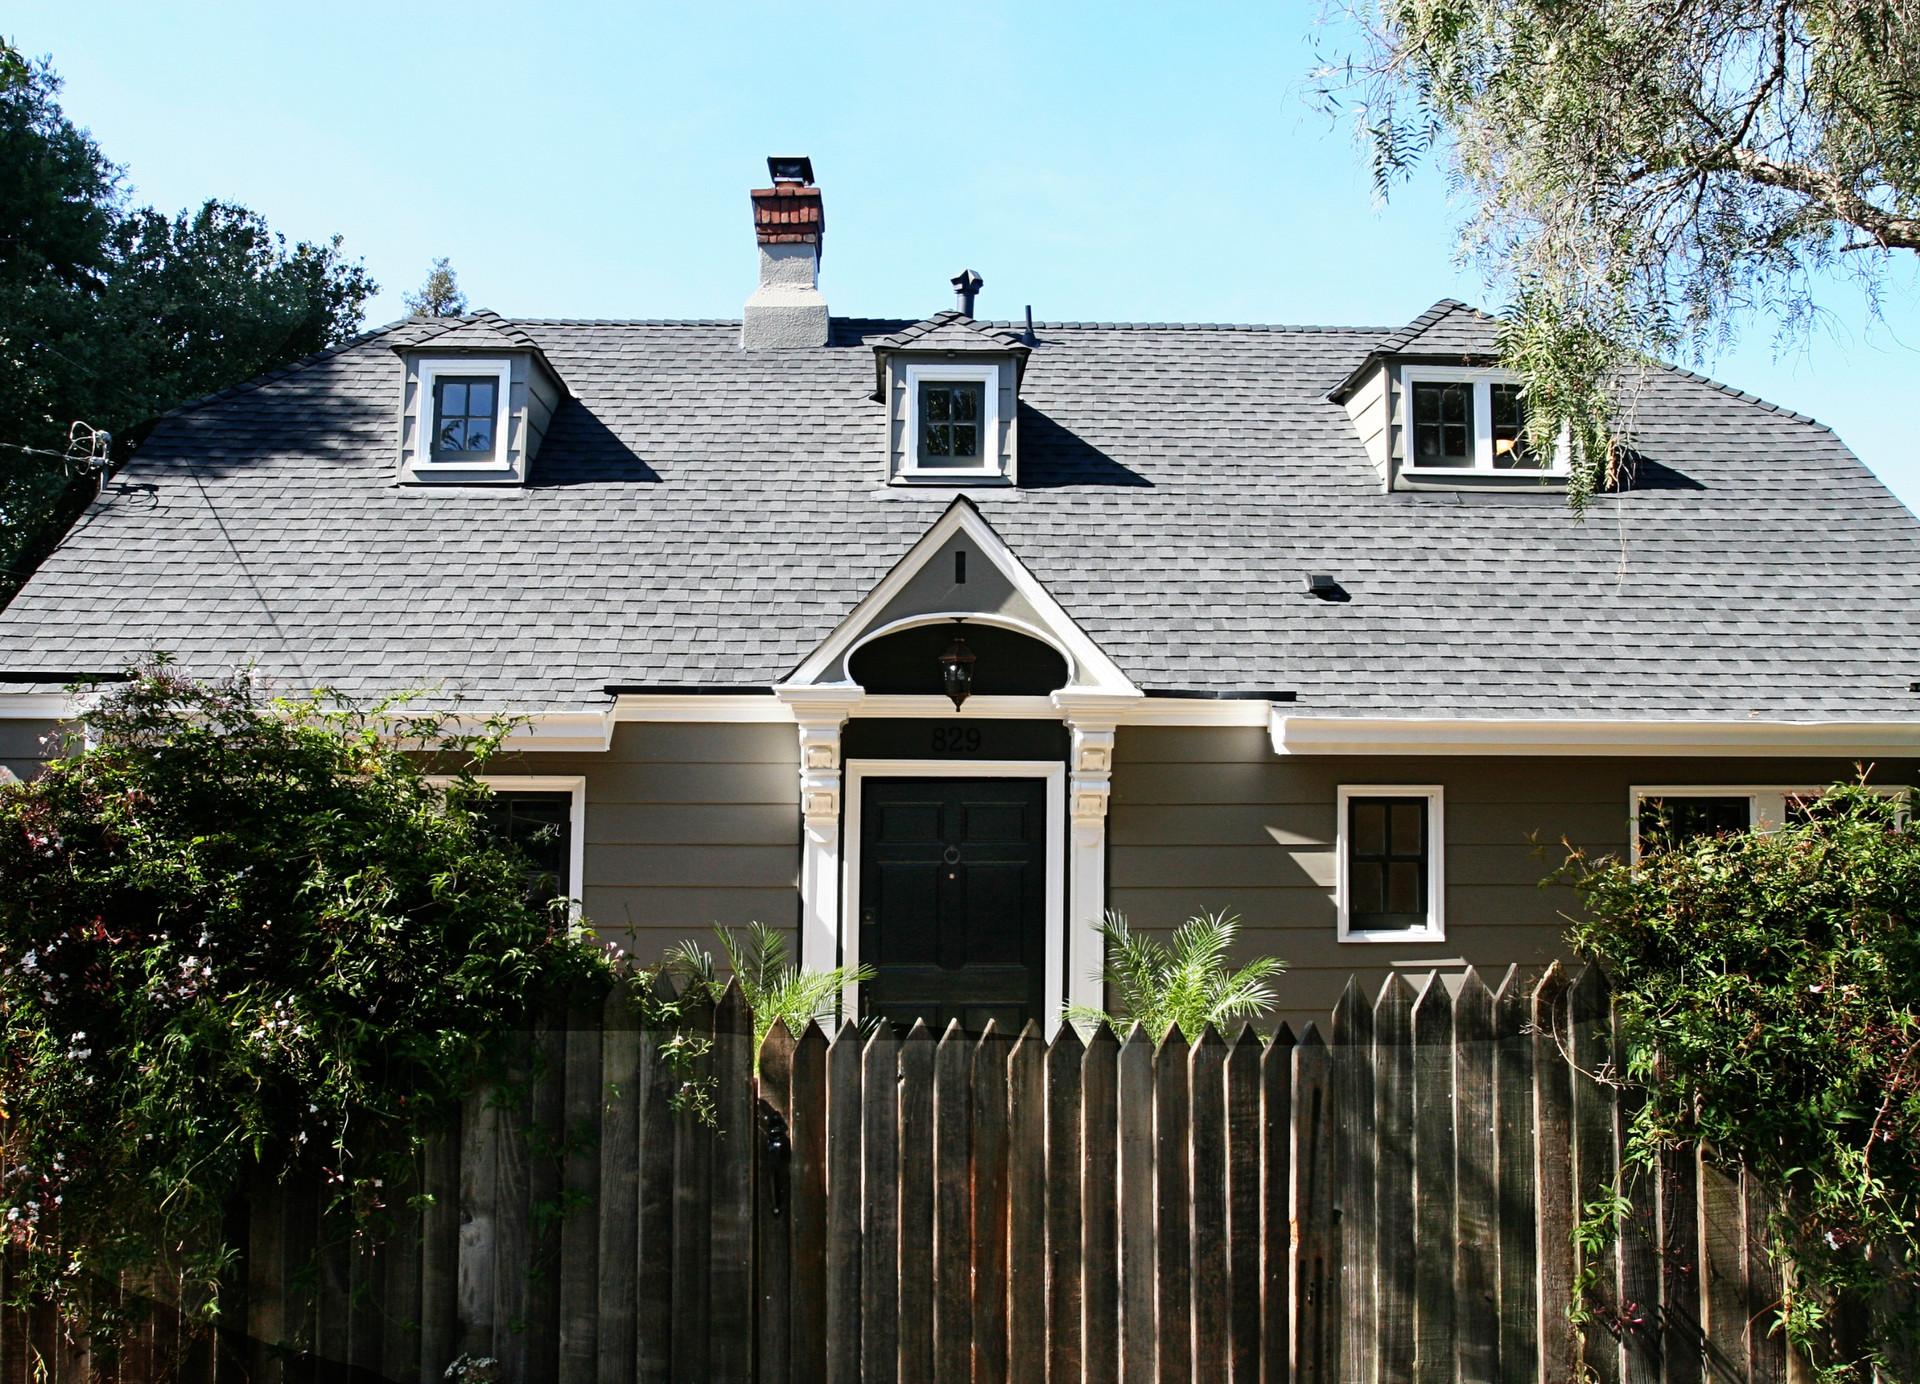 YELLAND HOUSE